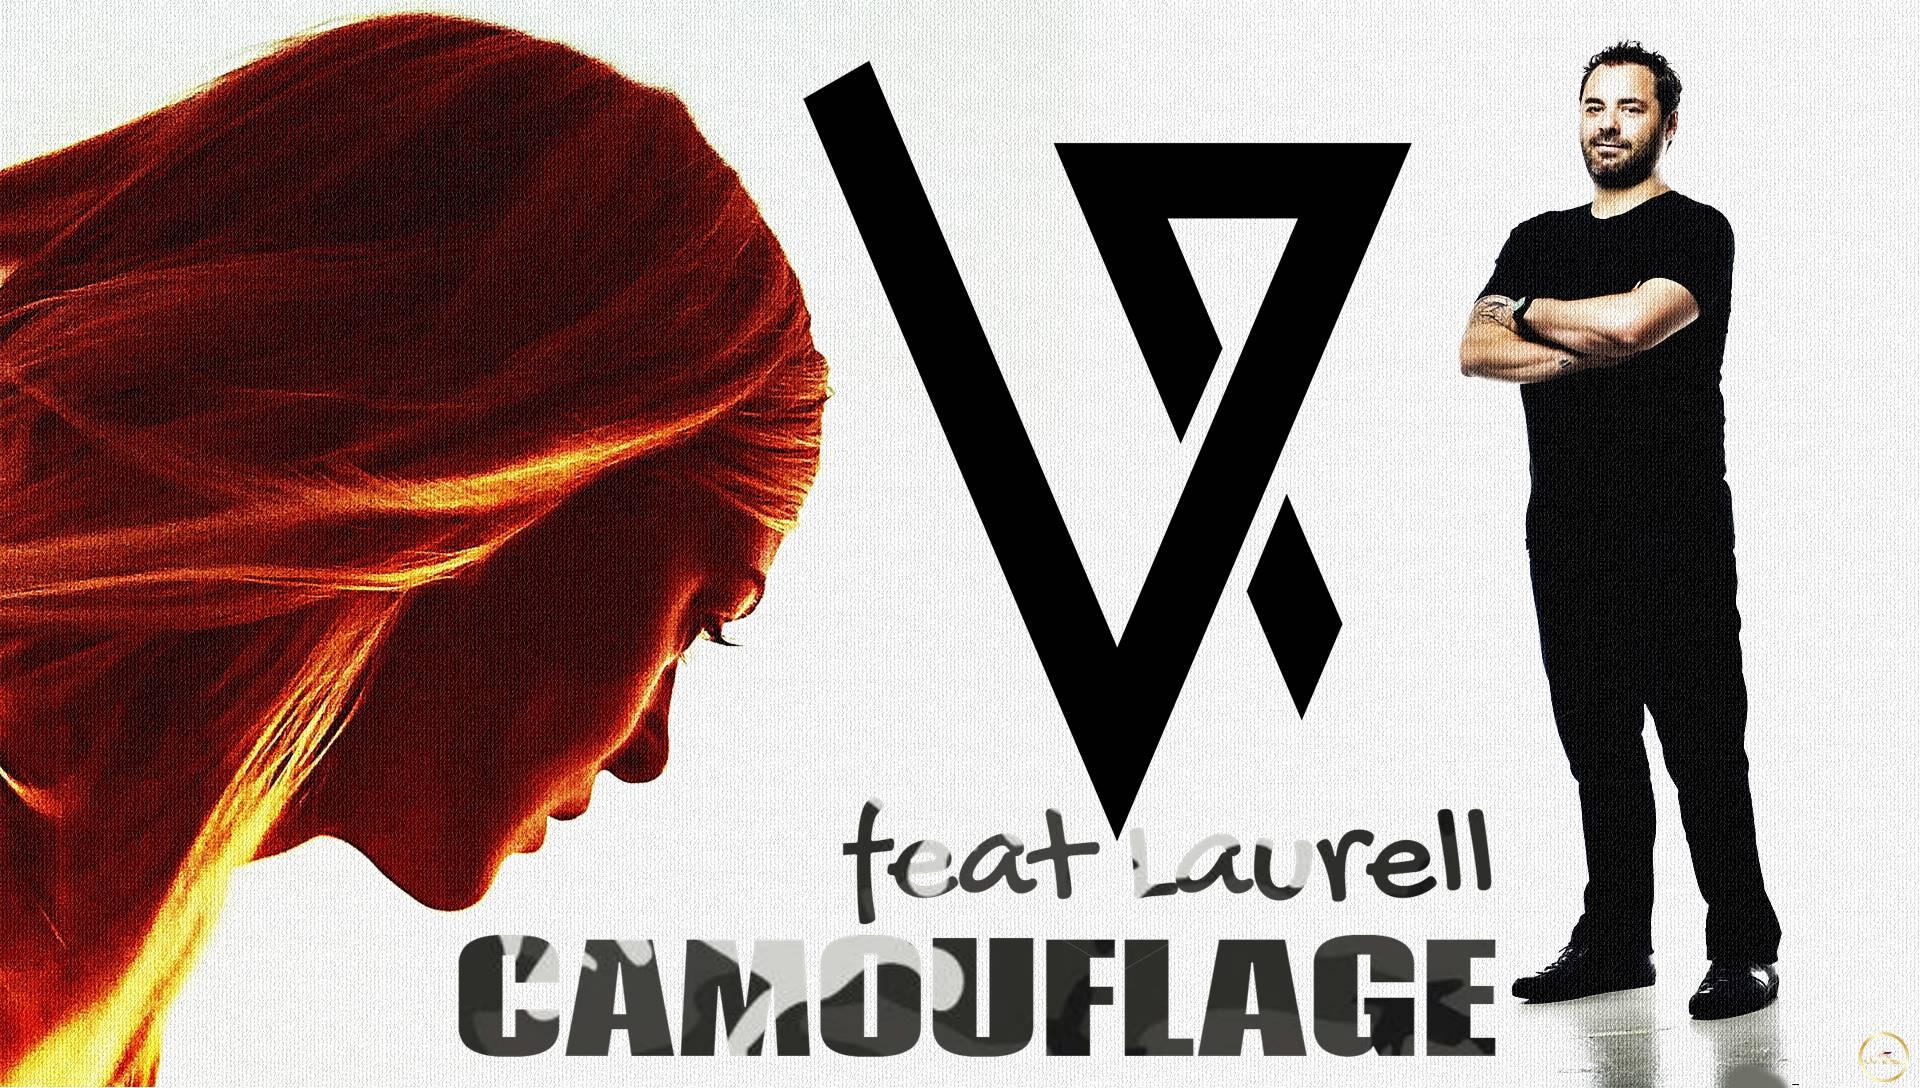 Velix - Laurell